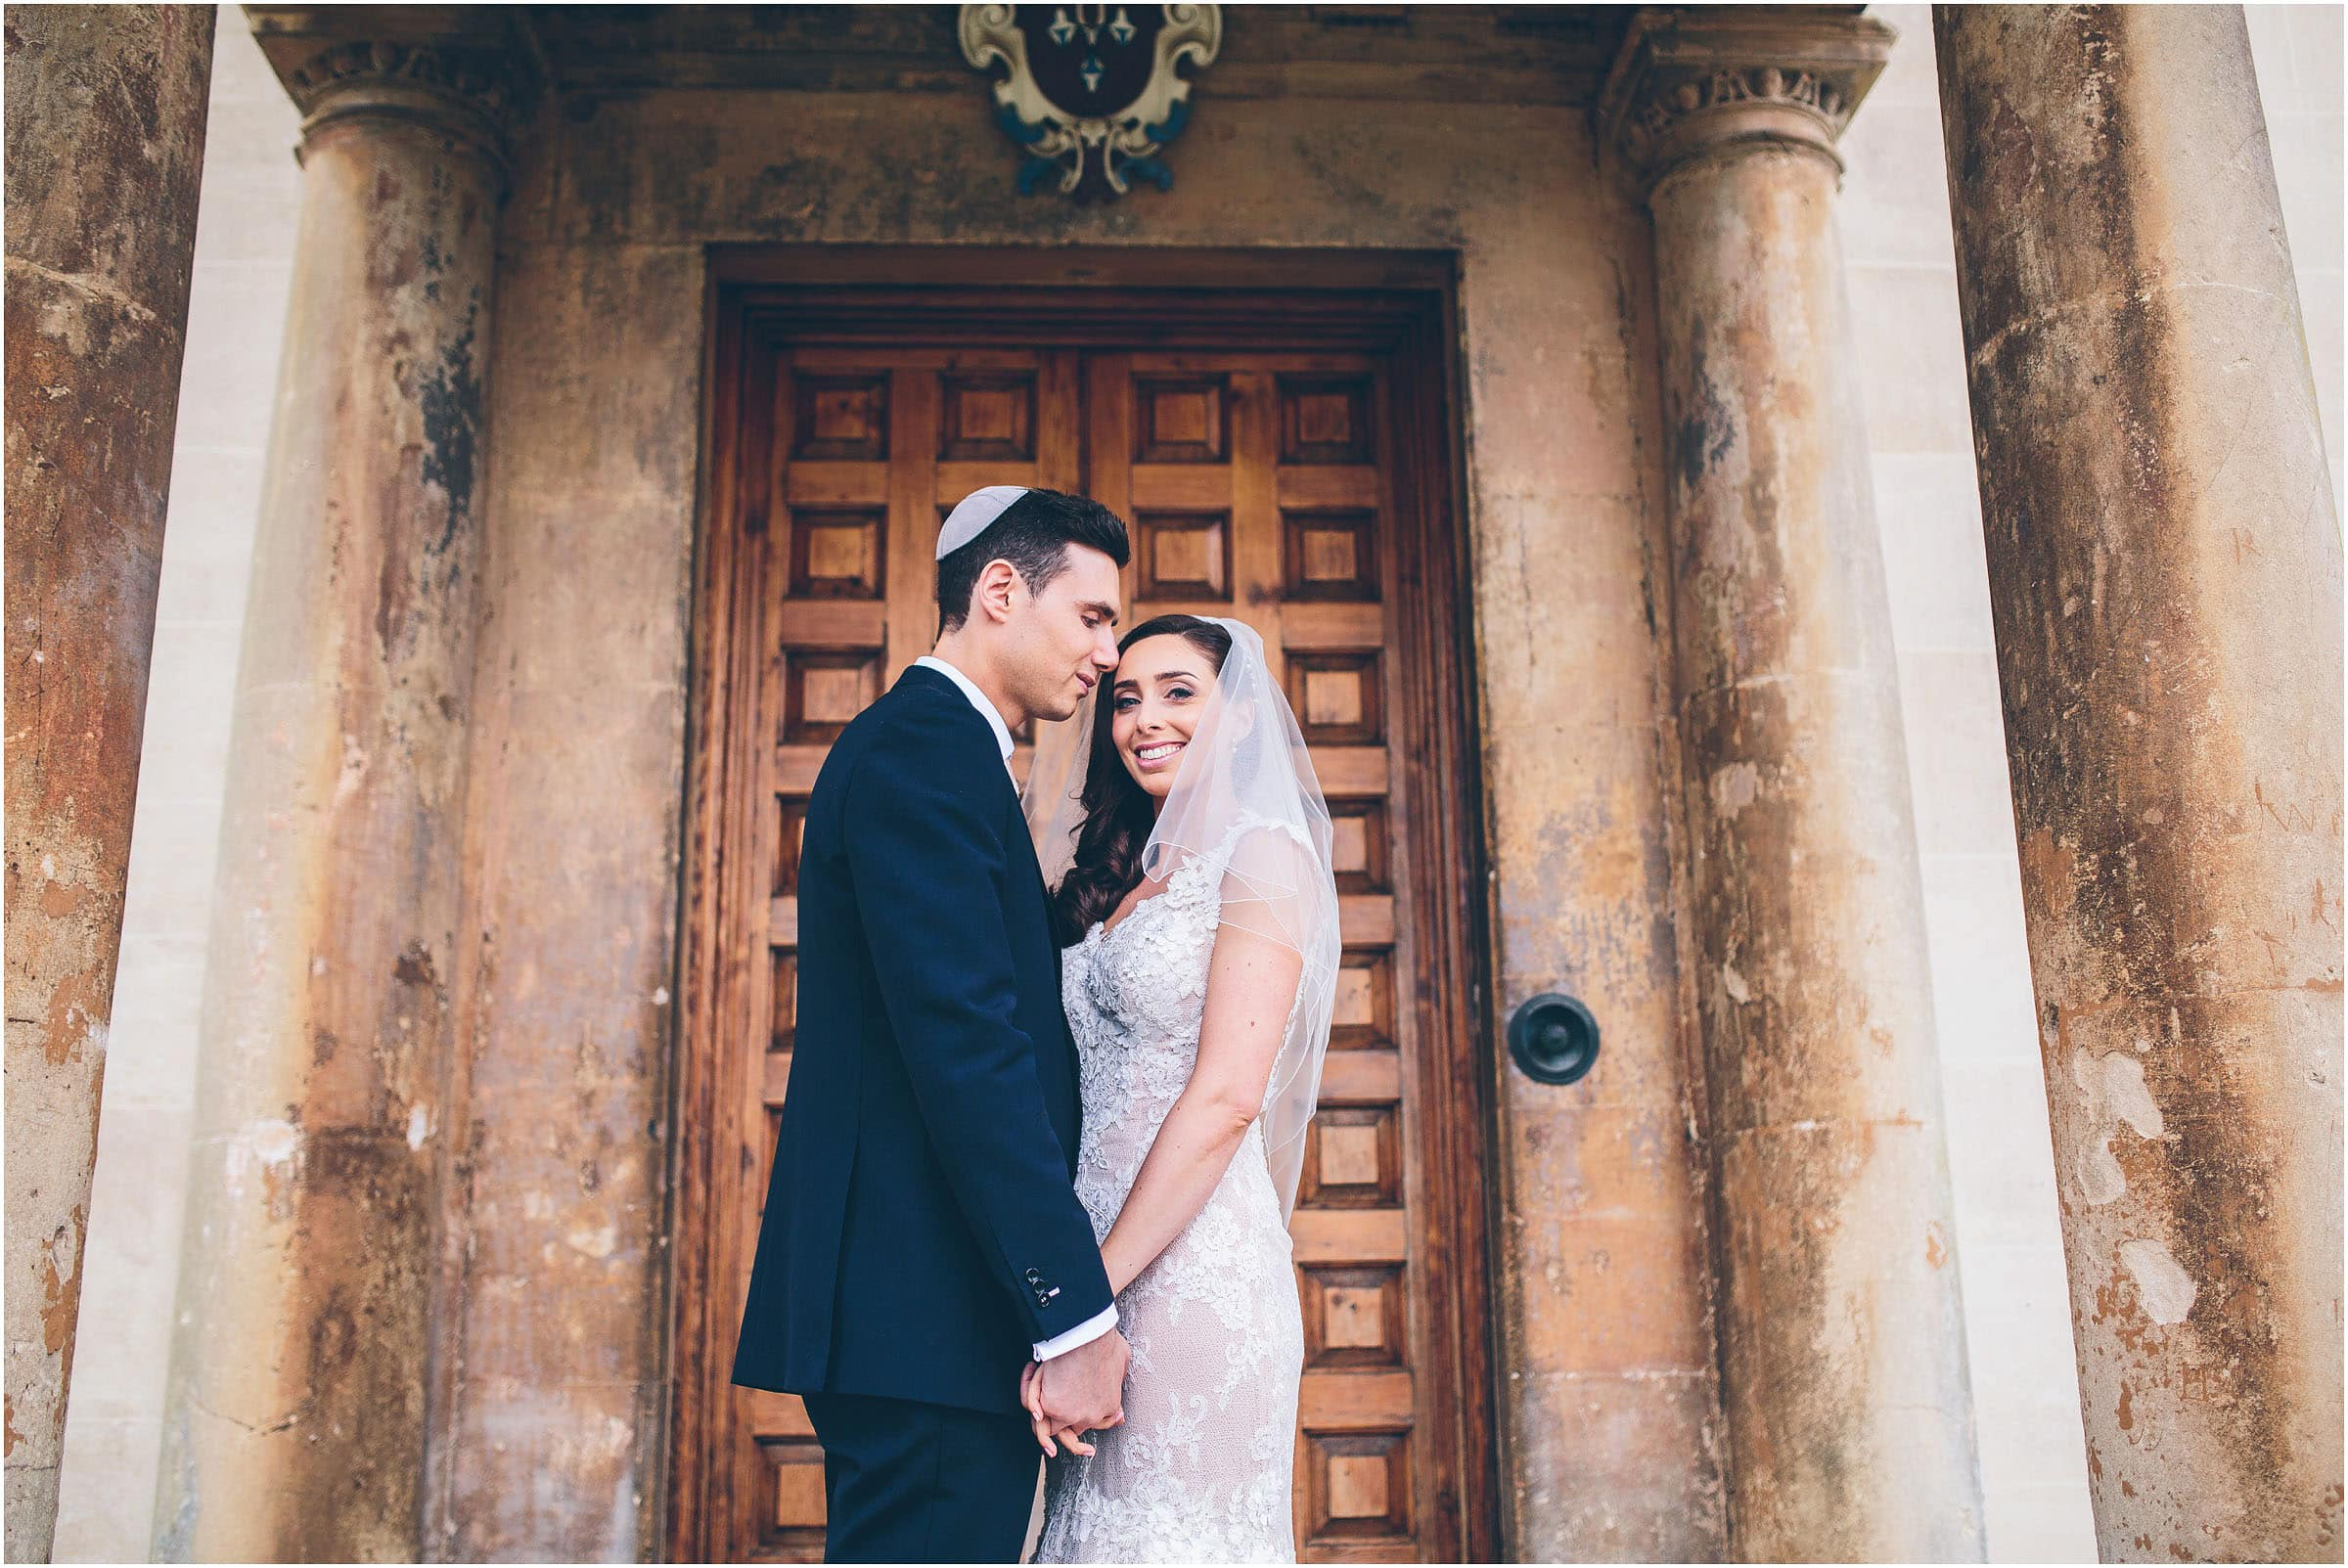 Elmore_Court_Wedding_Photography_0062